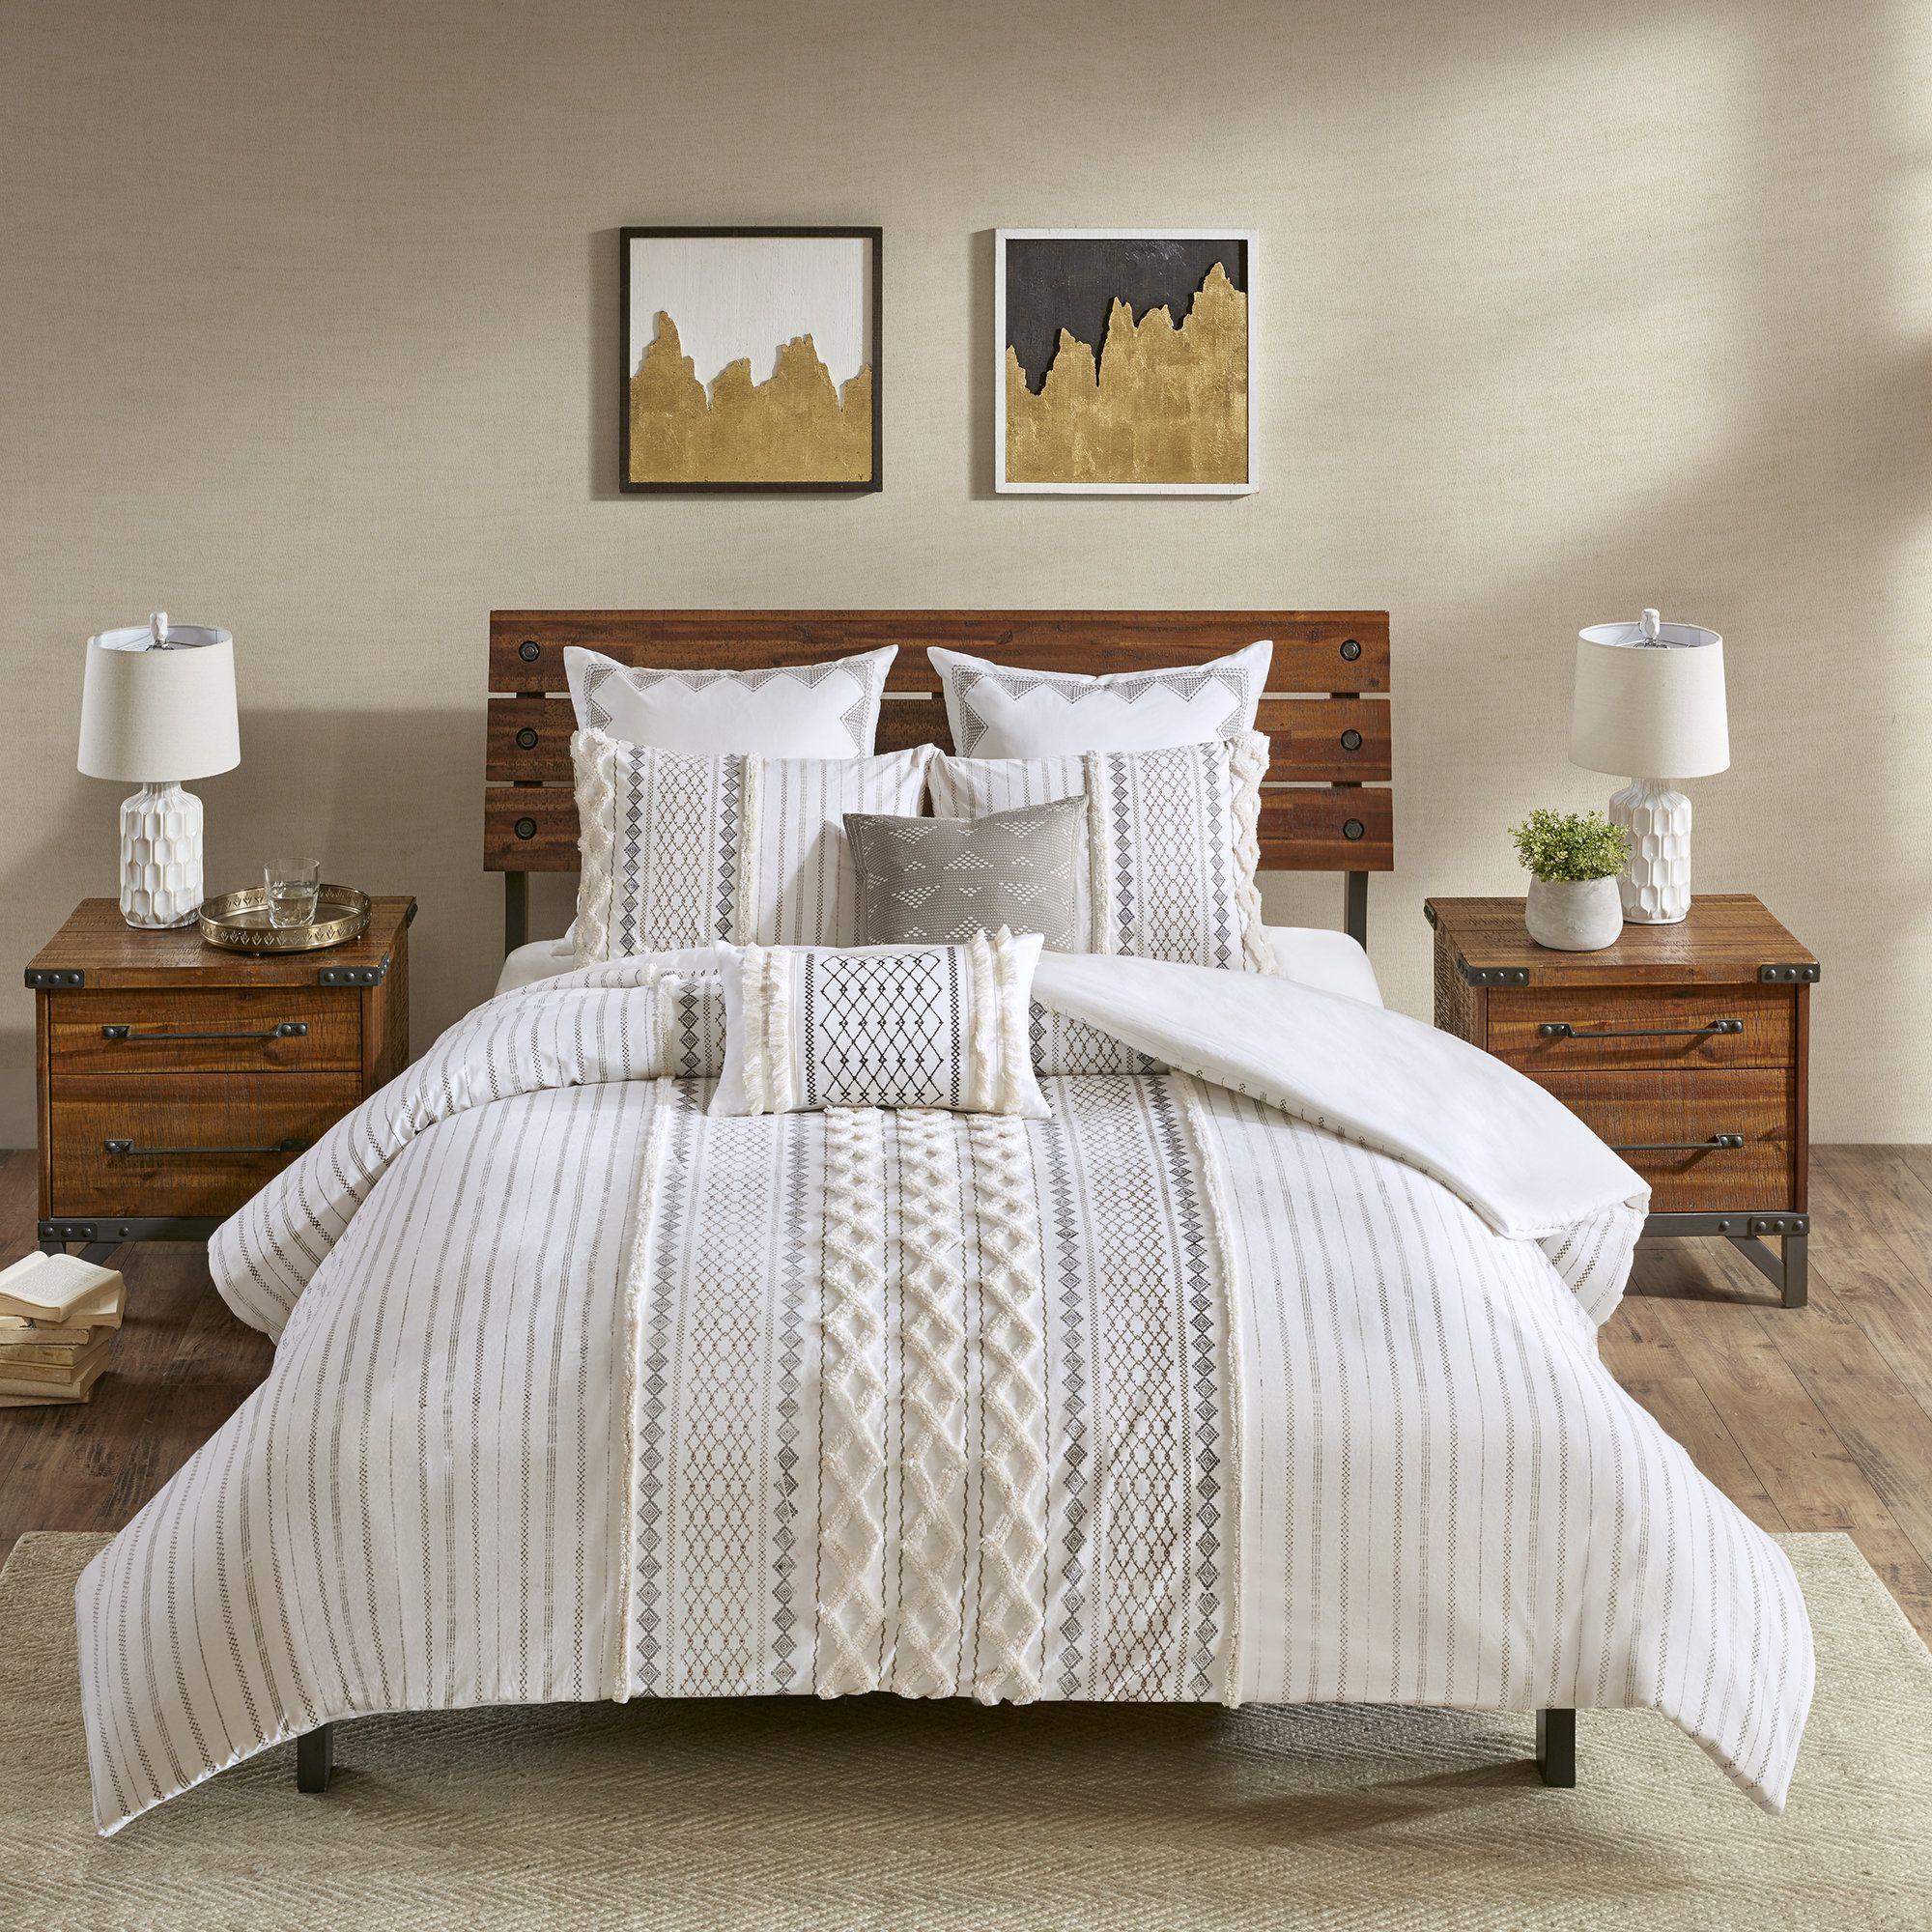 Jenkinsburg Comforter 100 Cotton 3 Piece Bedding Set Comforter